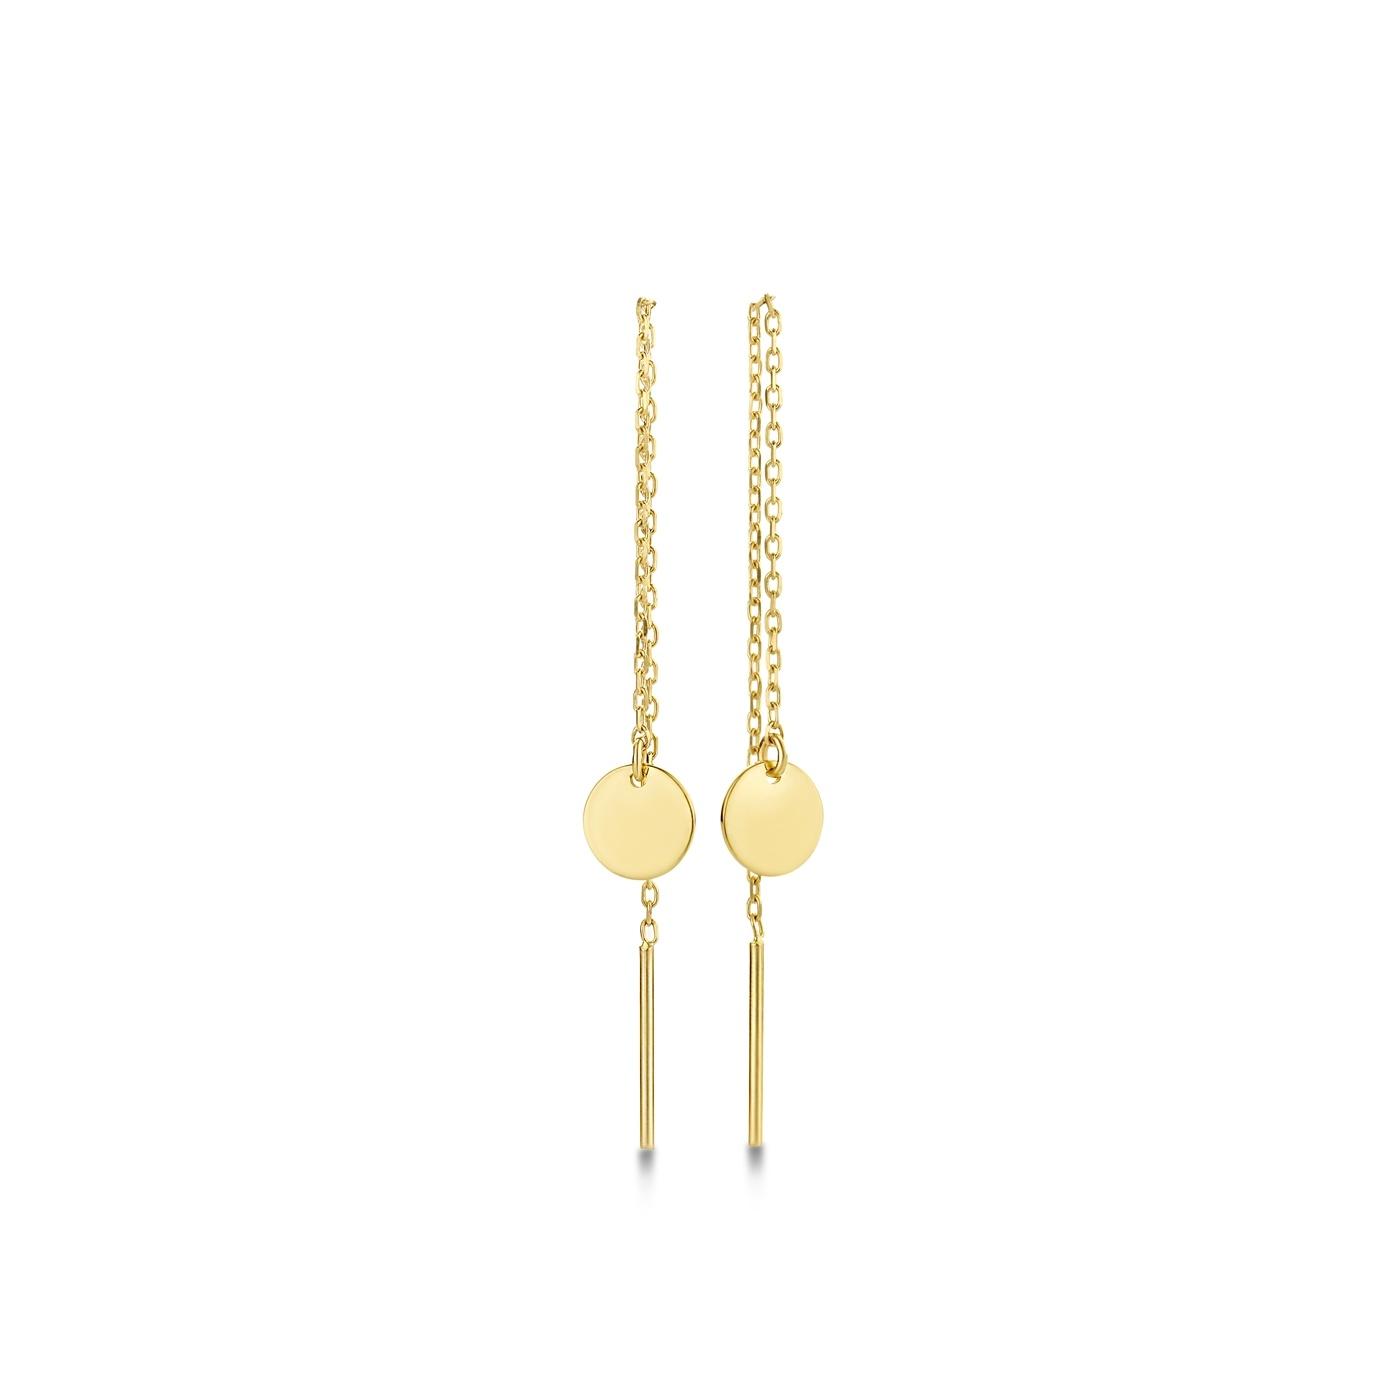 Isabel Bernard Le Marais Jeanne 14 karat gold drop earrings with circle